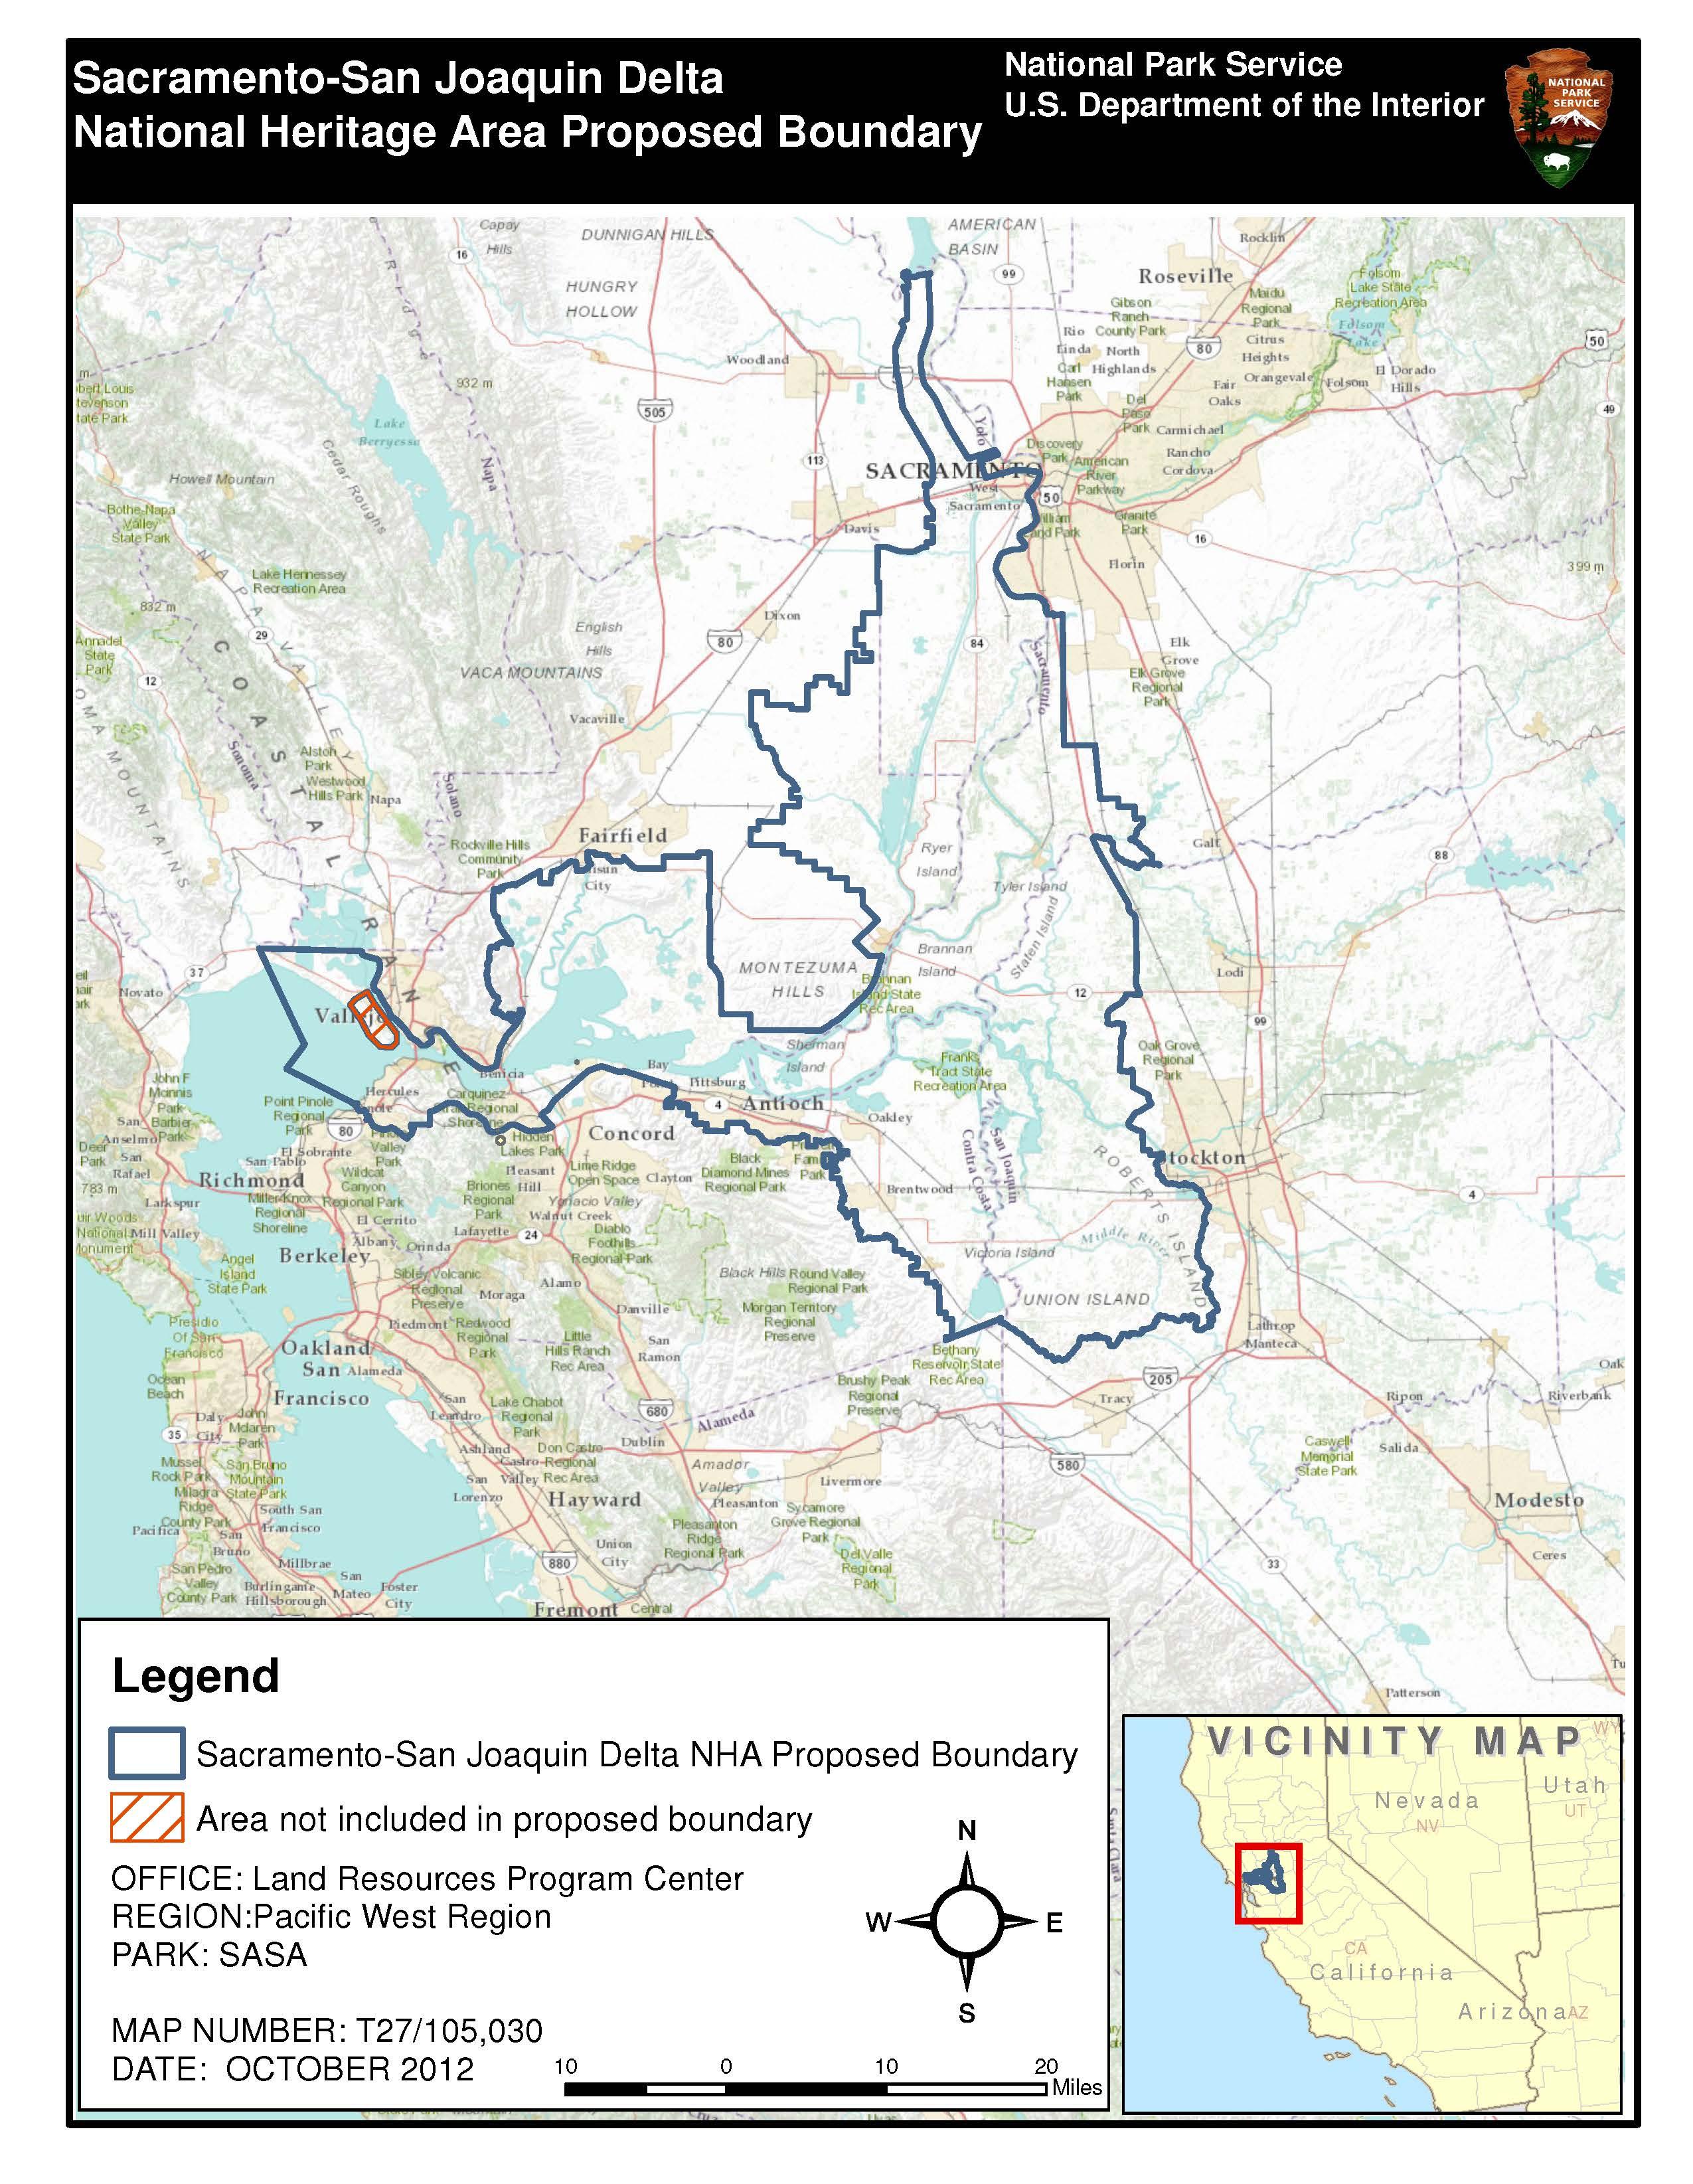 Feinstein Harris Reintroduce Bill To Establish SacramentoSan - San joaquin on map of us